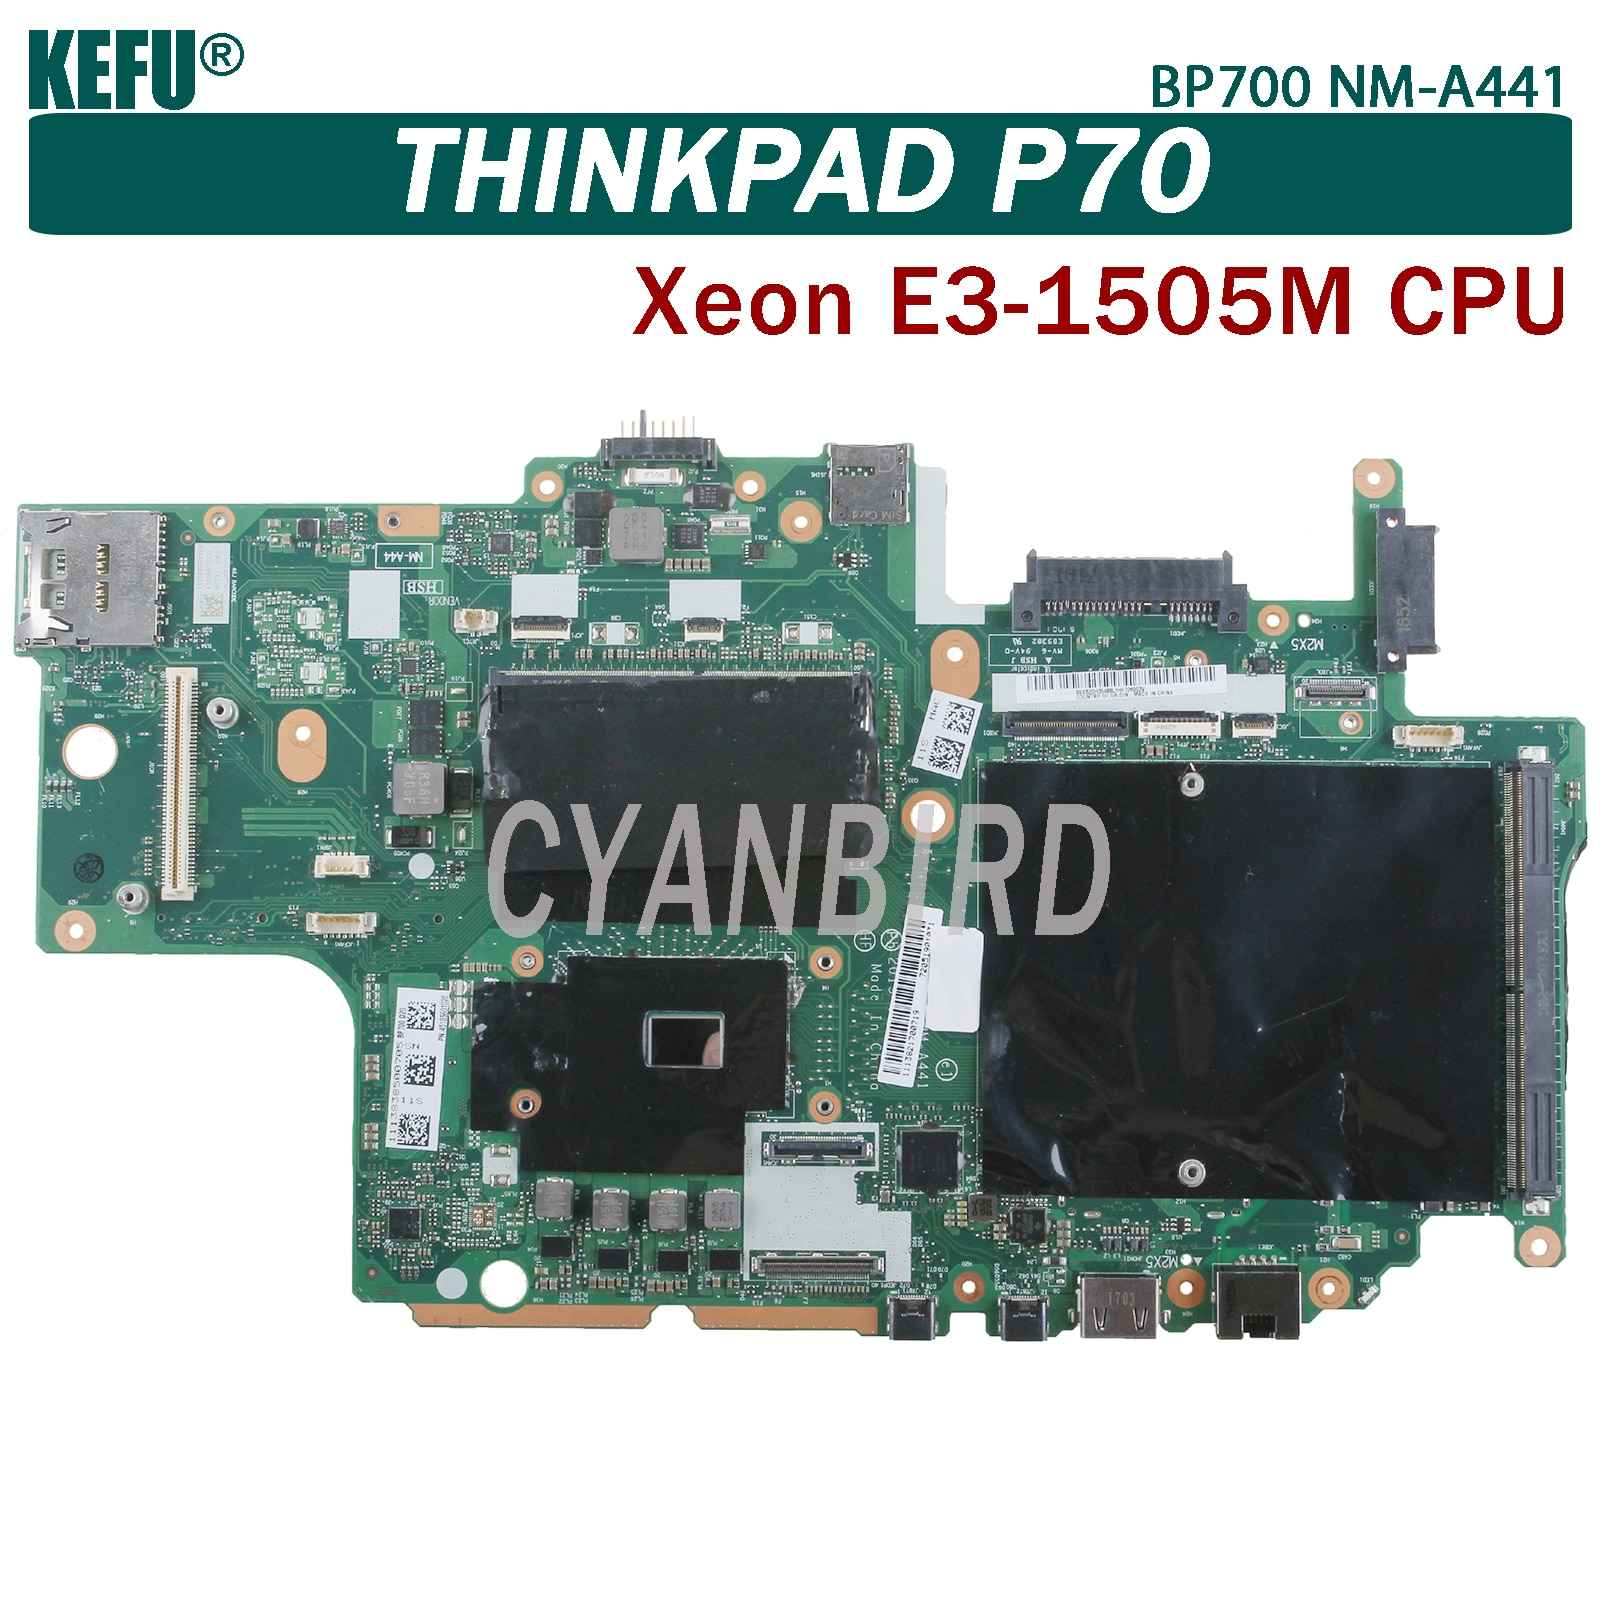 KEFU BP700 NM-A441 اللوحة الرئيسية الأصلية لينوفو ثينك باد P70 مع Xeon E3-1505 وحدة المعالجة المركزية اللوحة الأم للكمبيوتر المحمول